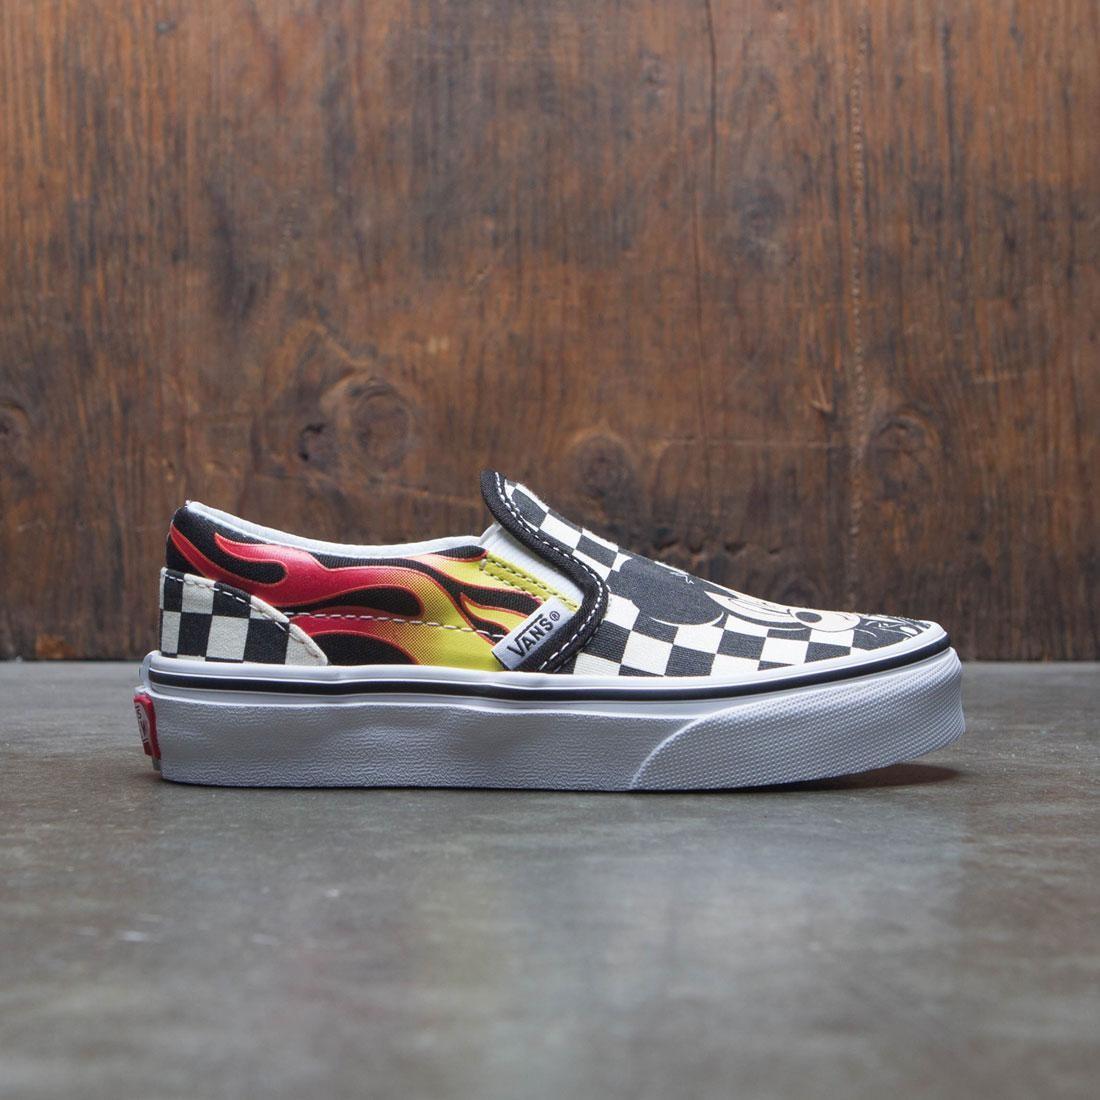 4c1fade549 Vans x Disney Big Kids Classic Slip-On - Mickey (black / checkerboard /  flame)